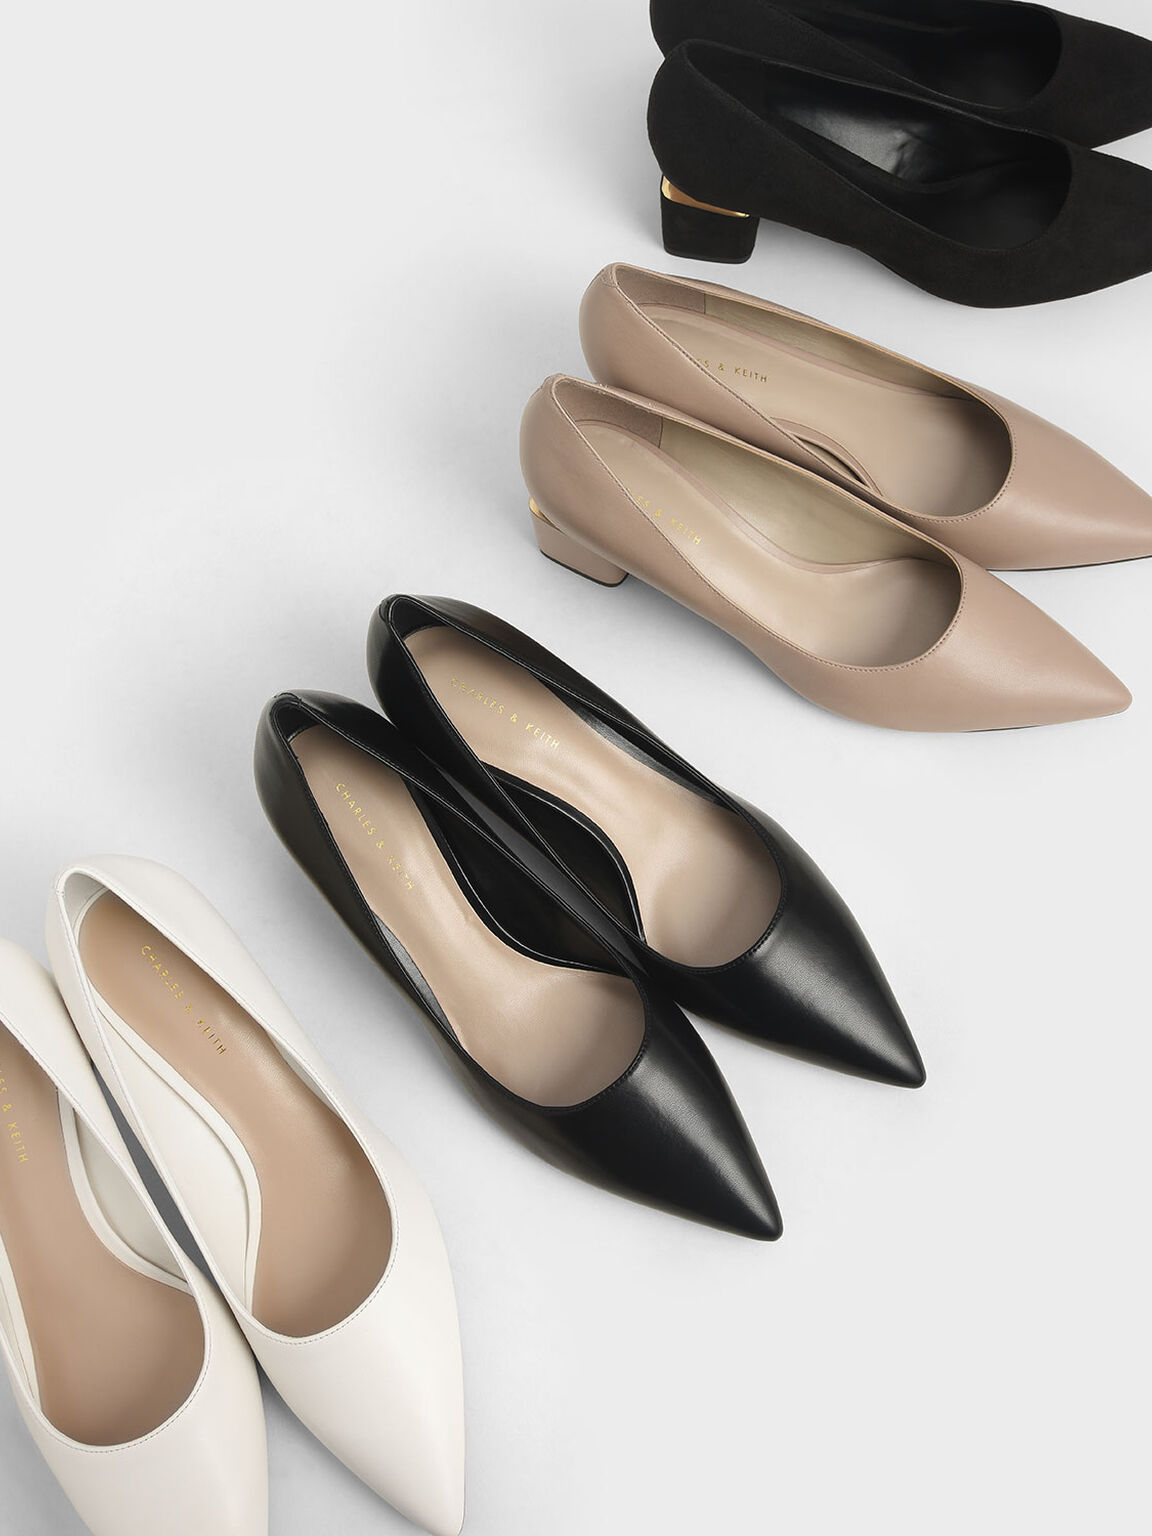 Sepatu Metal Accented Pointed Toe Pumps, Black, hi-res